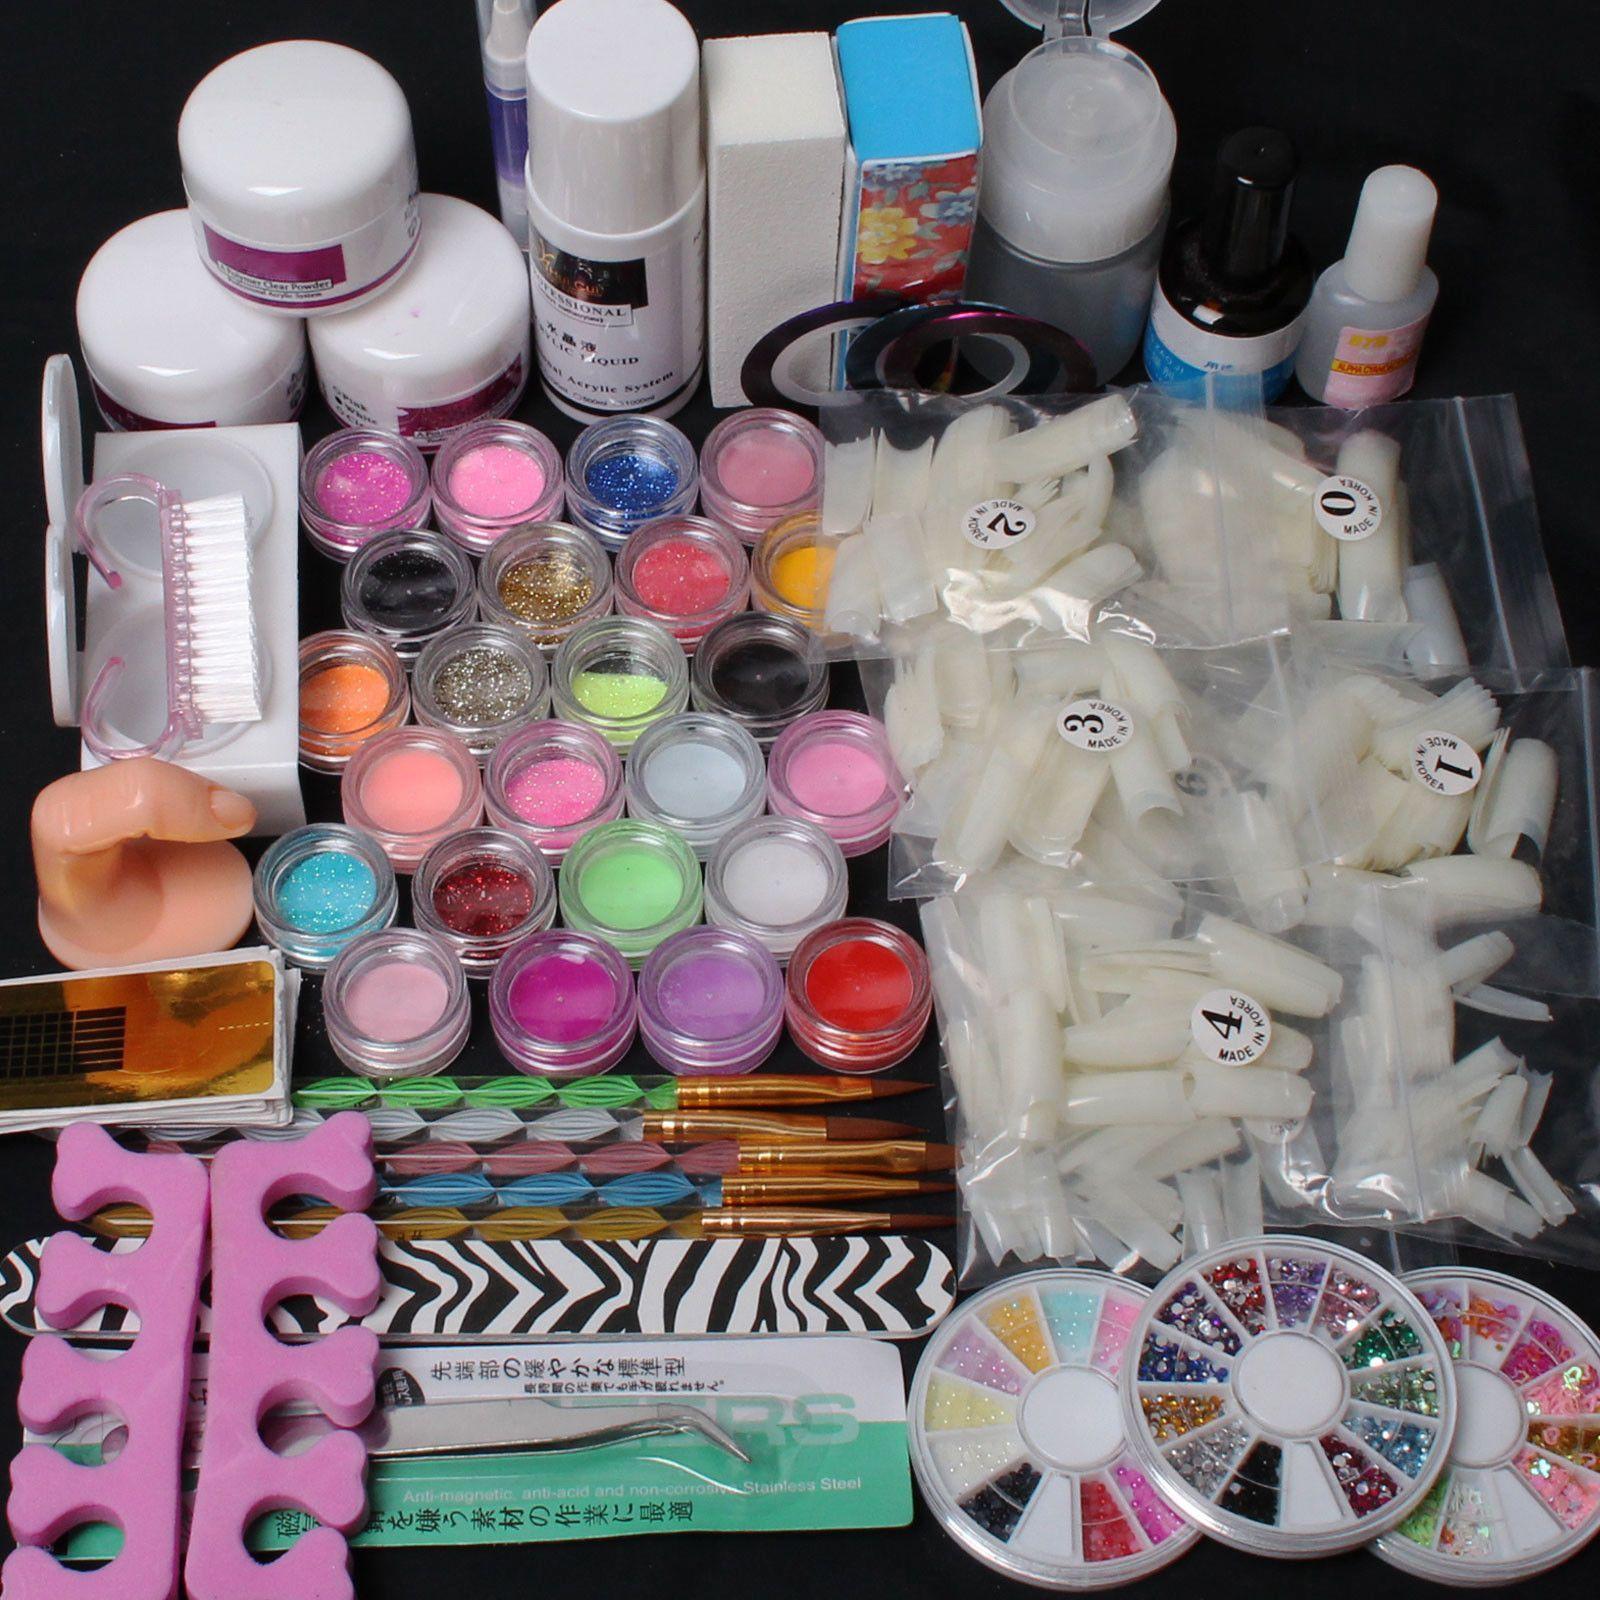 Diy Manicure Nail Art Kit 500pcs Half Nail Tips Acrylic Liquid